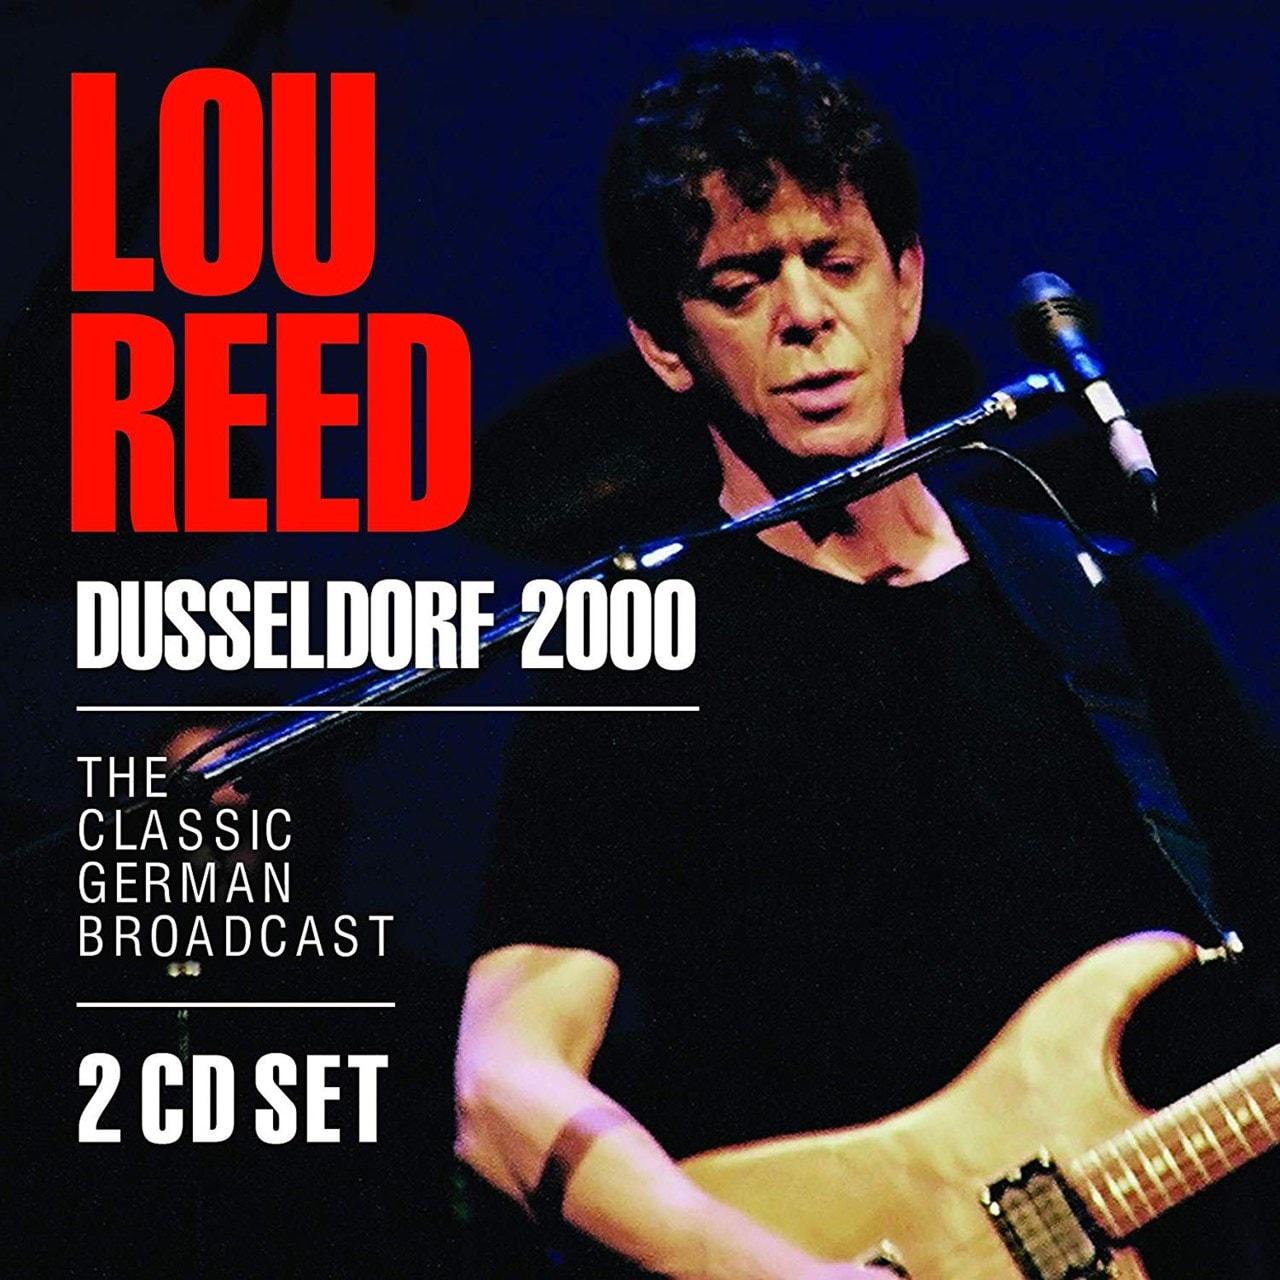 Dusseldorf 2000: The Classic German Broadcast - 1